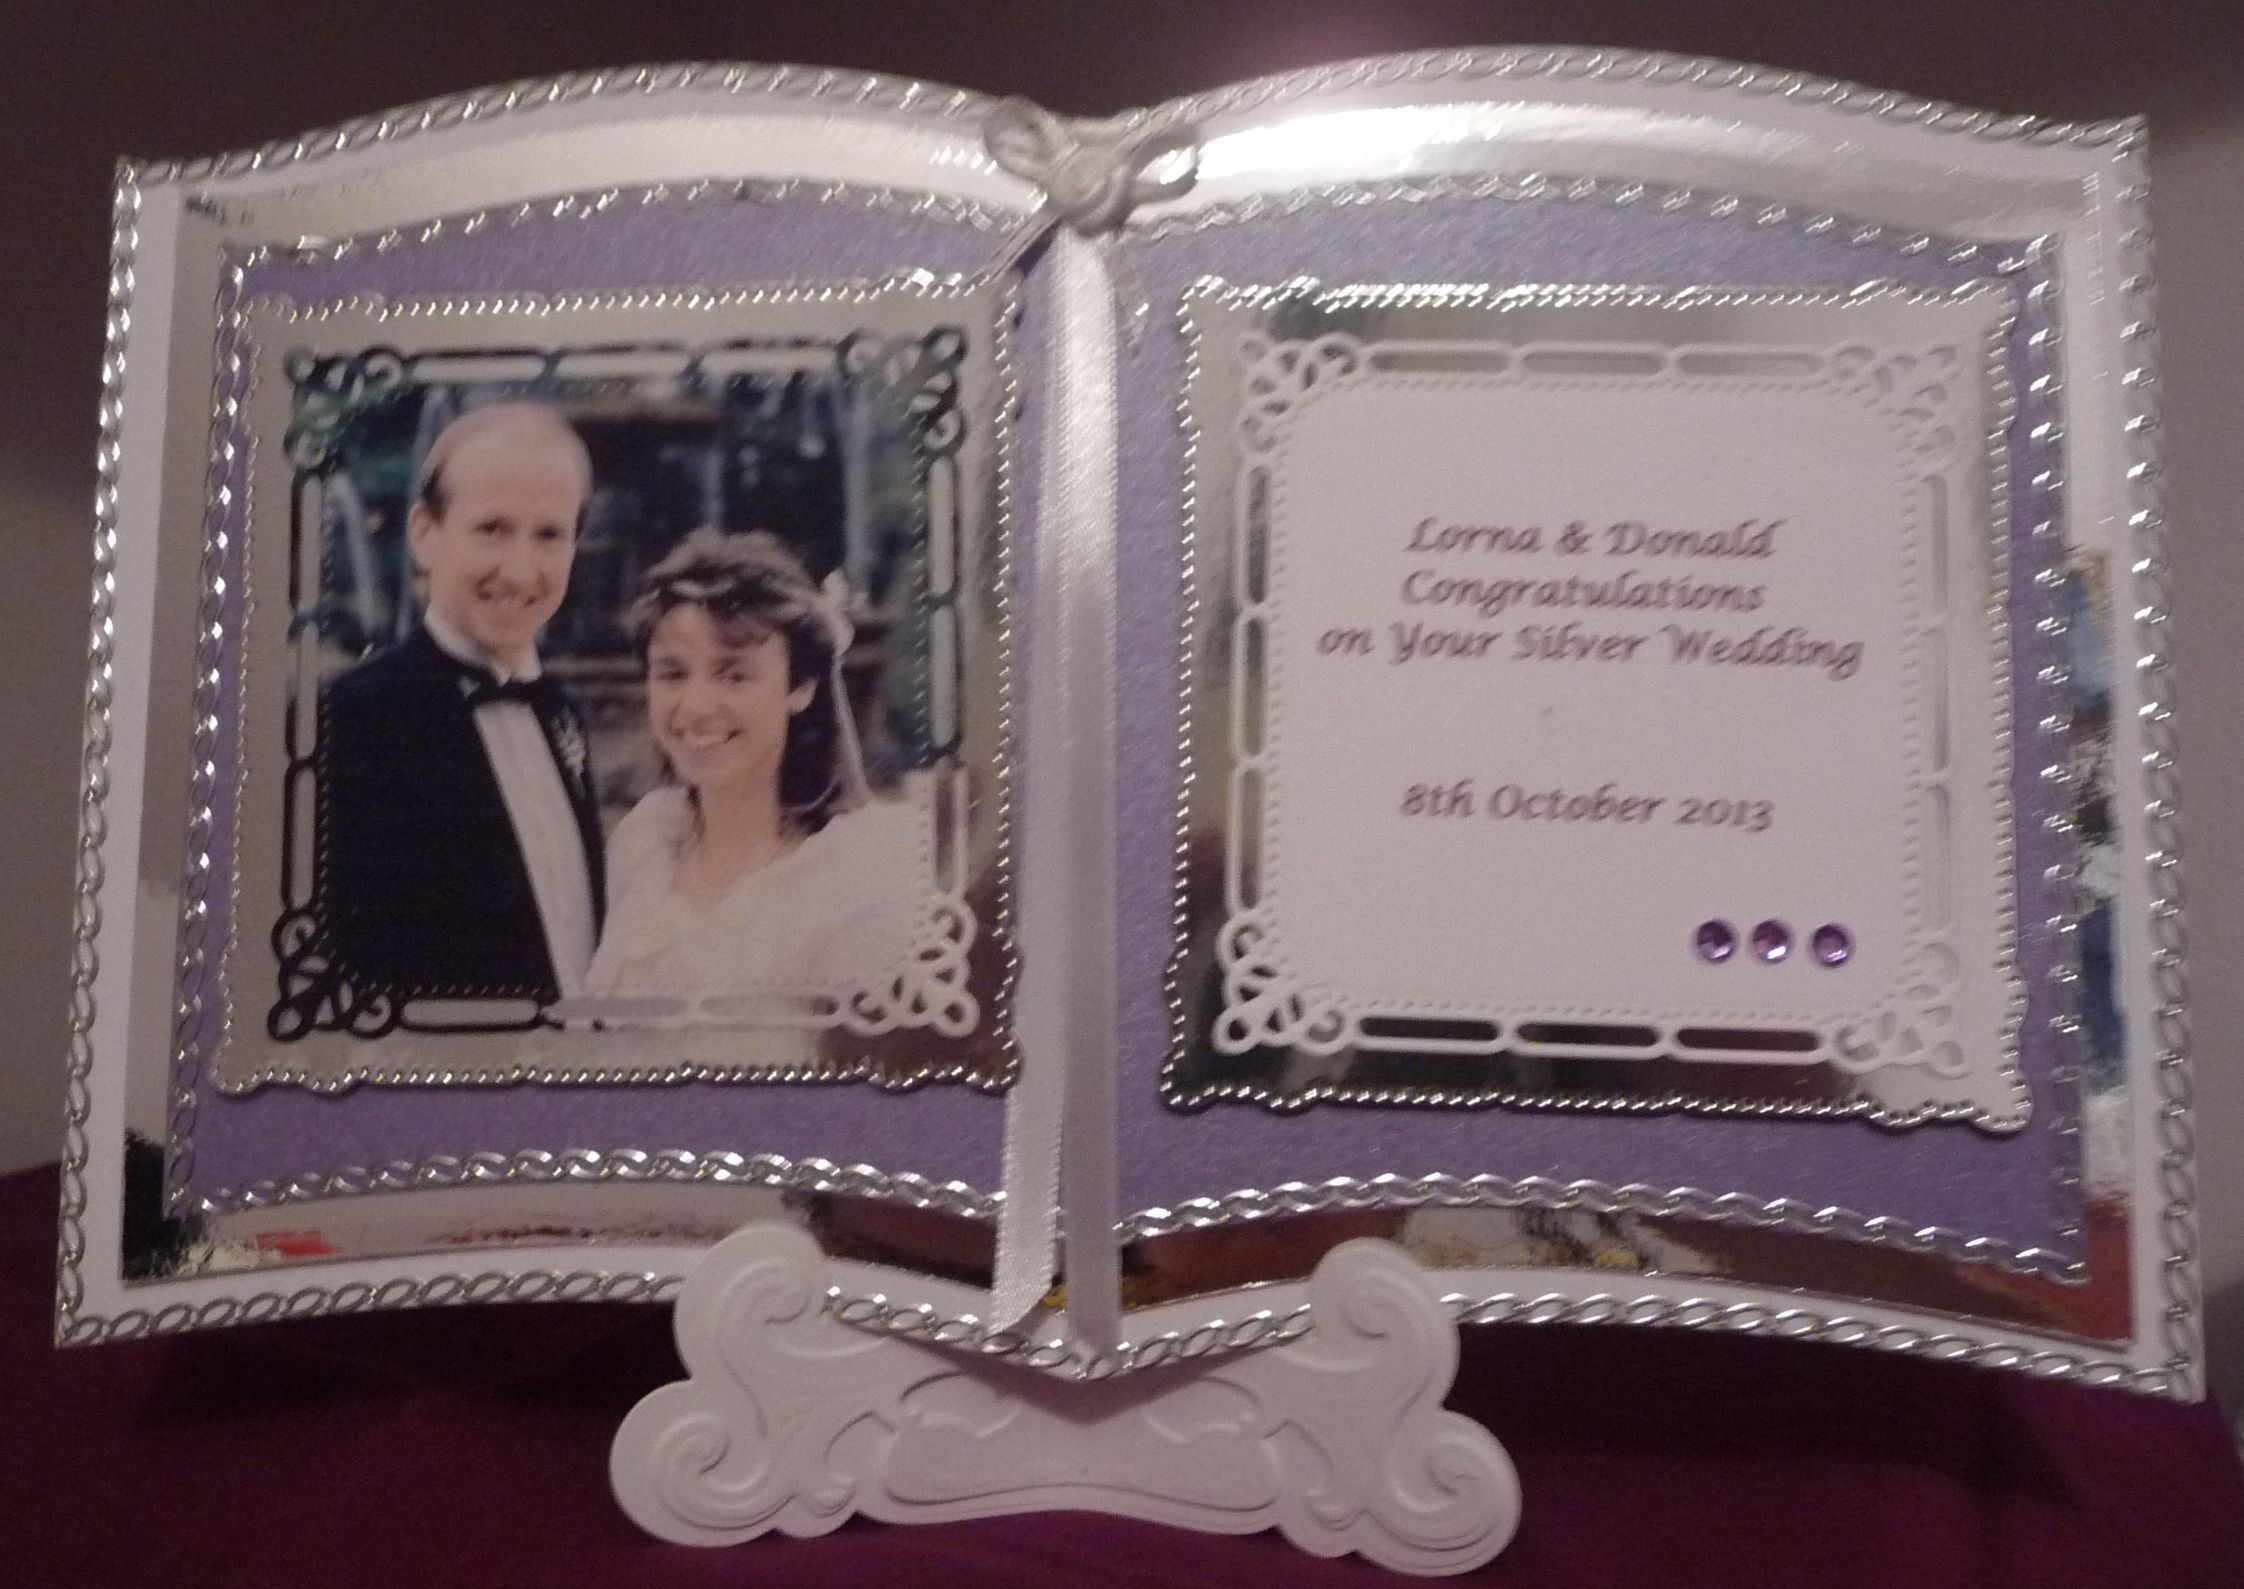 Bookatrix silver wedding card bookatrix and book cards pinterest